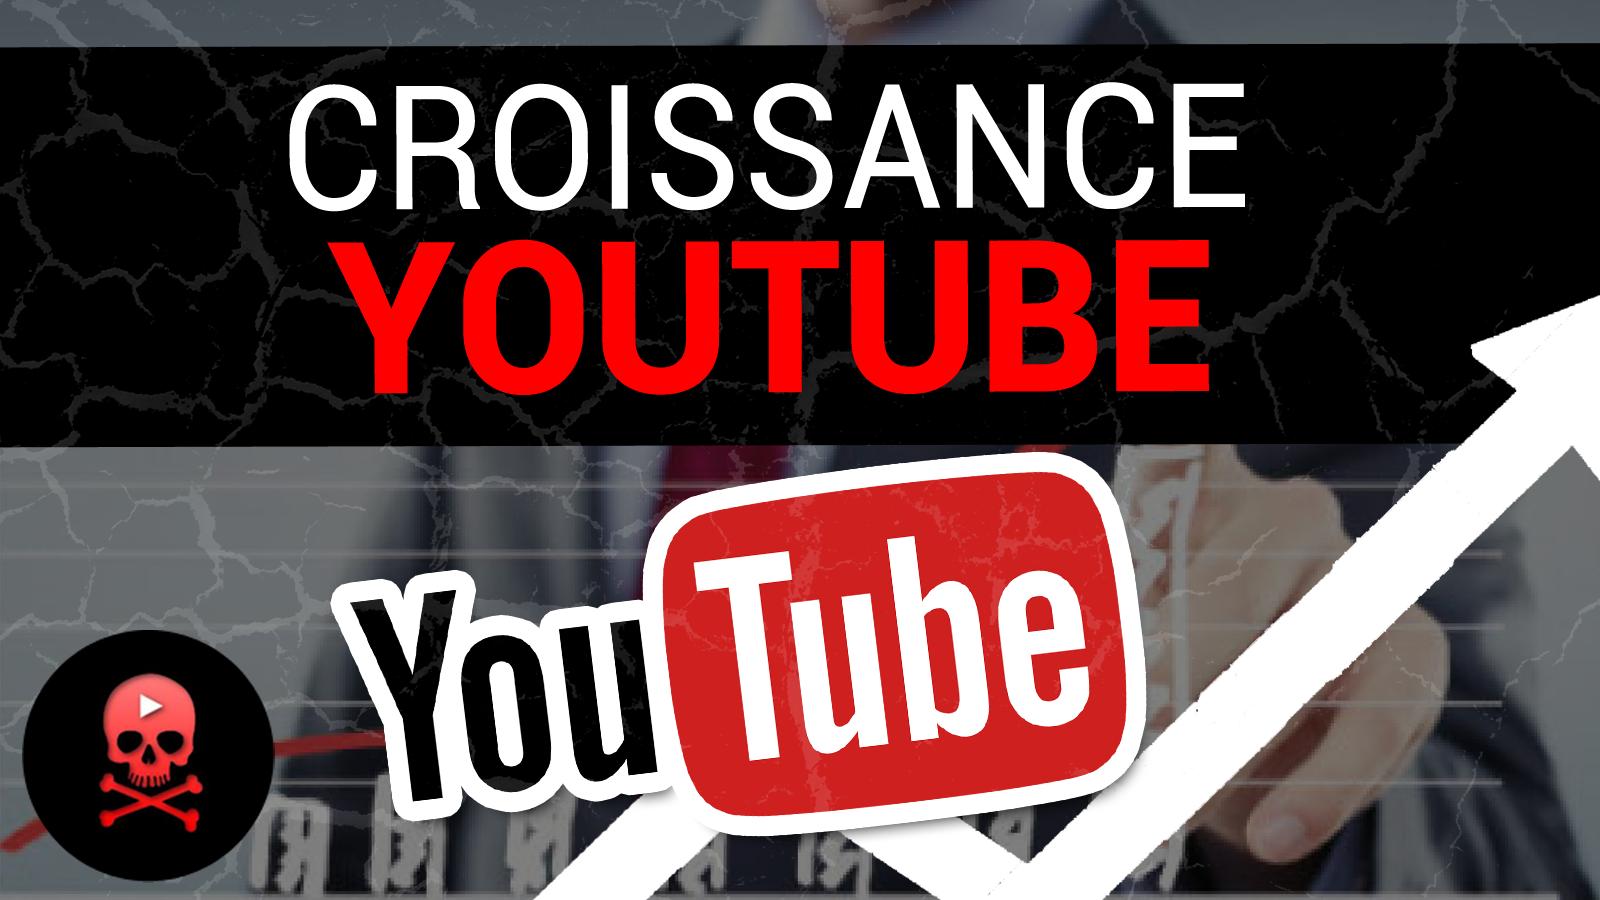 croissance youtube